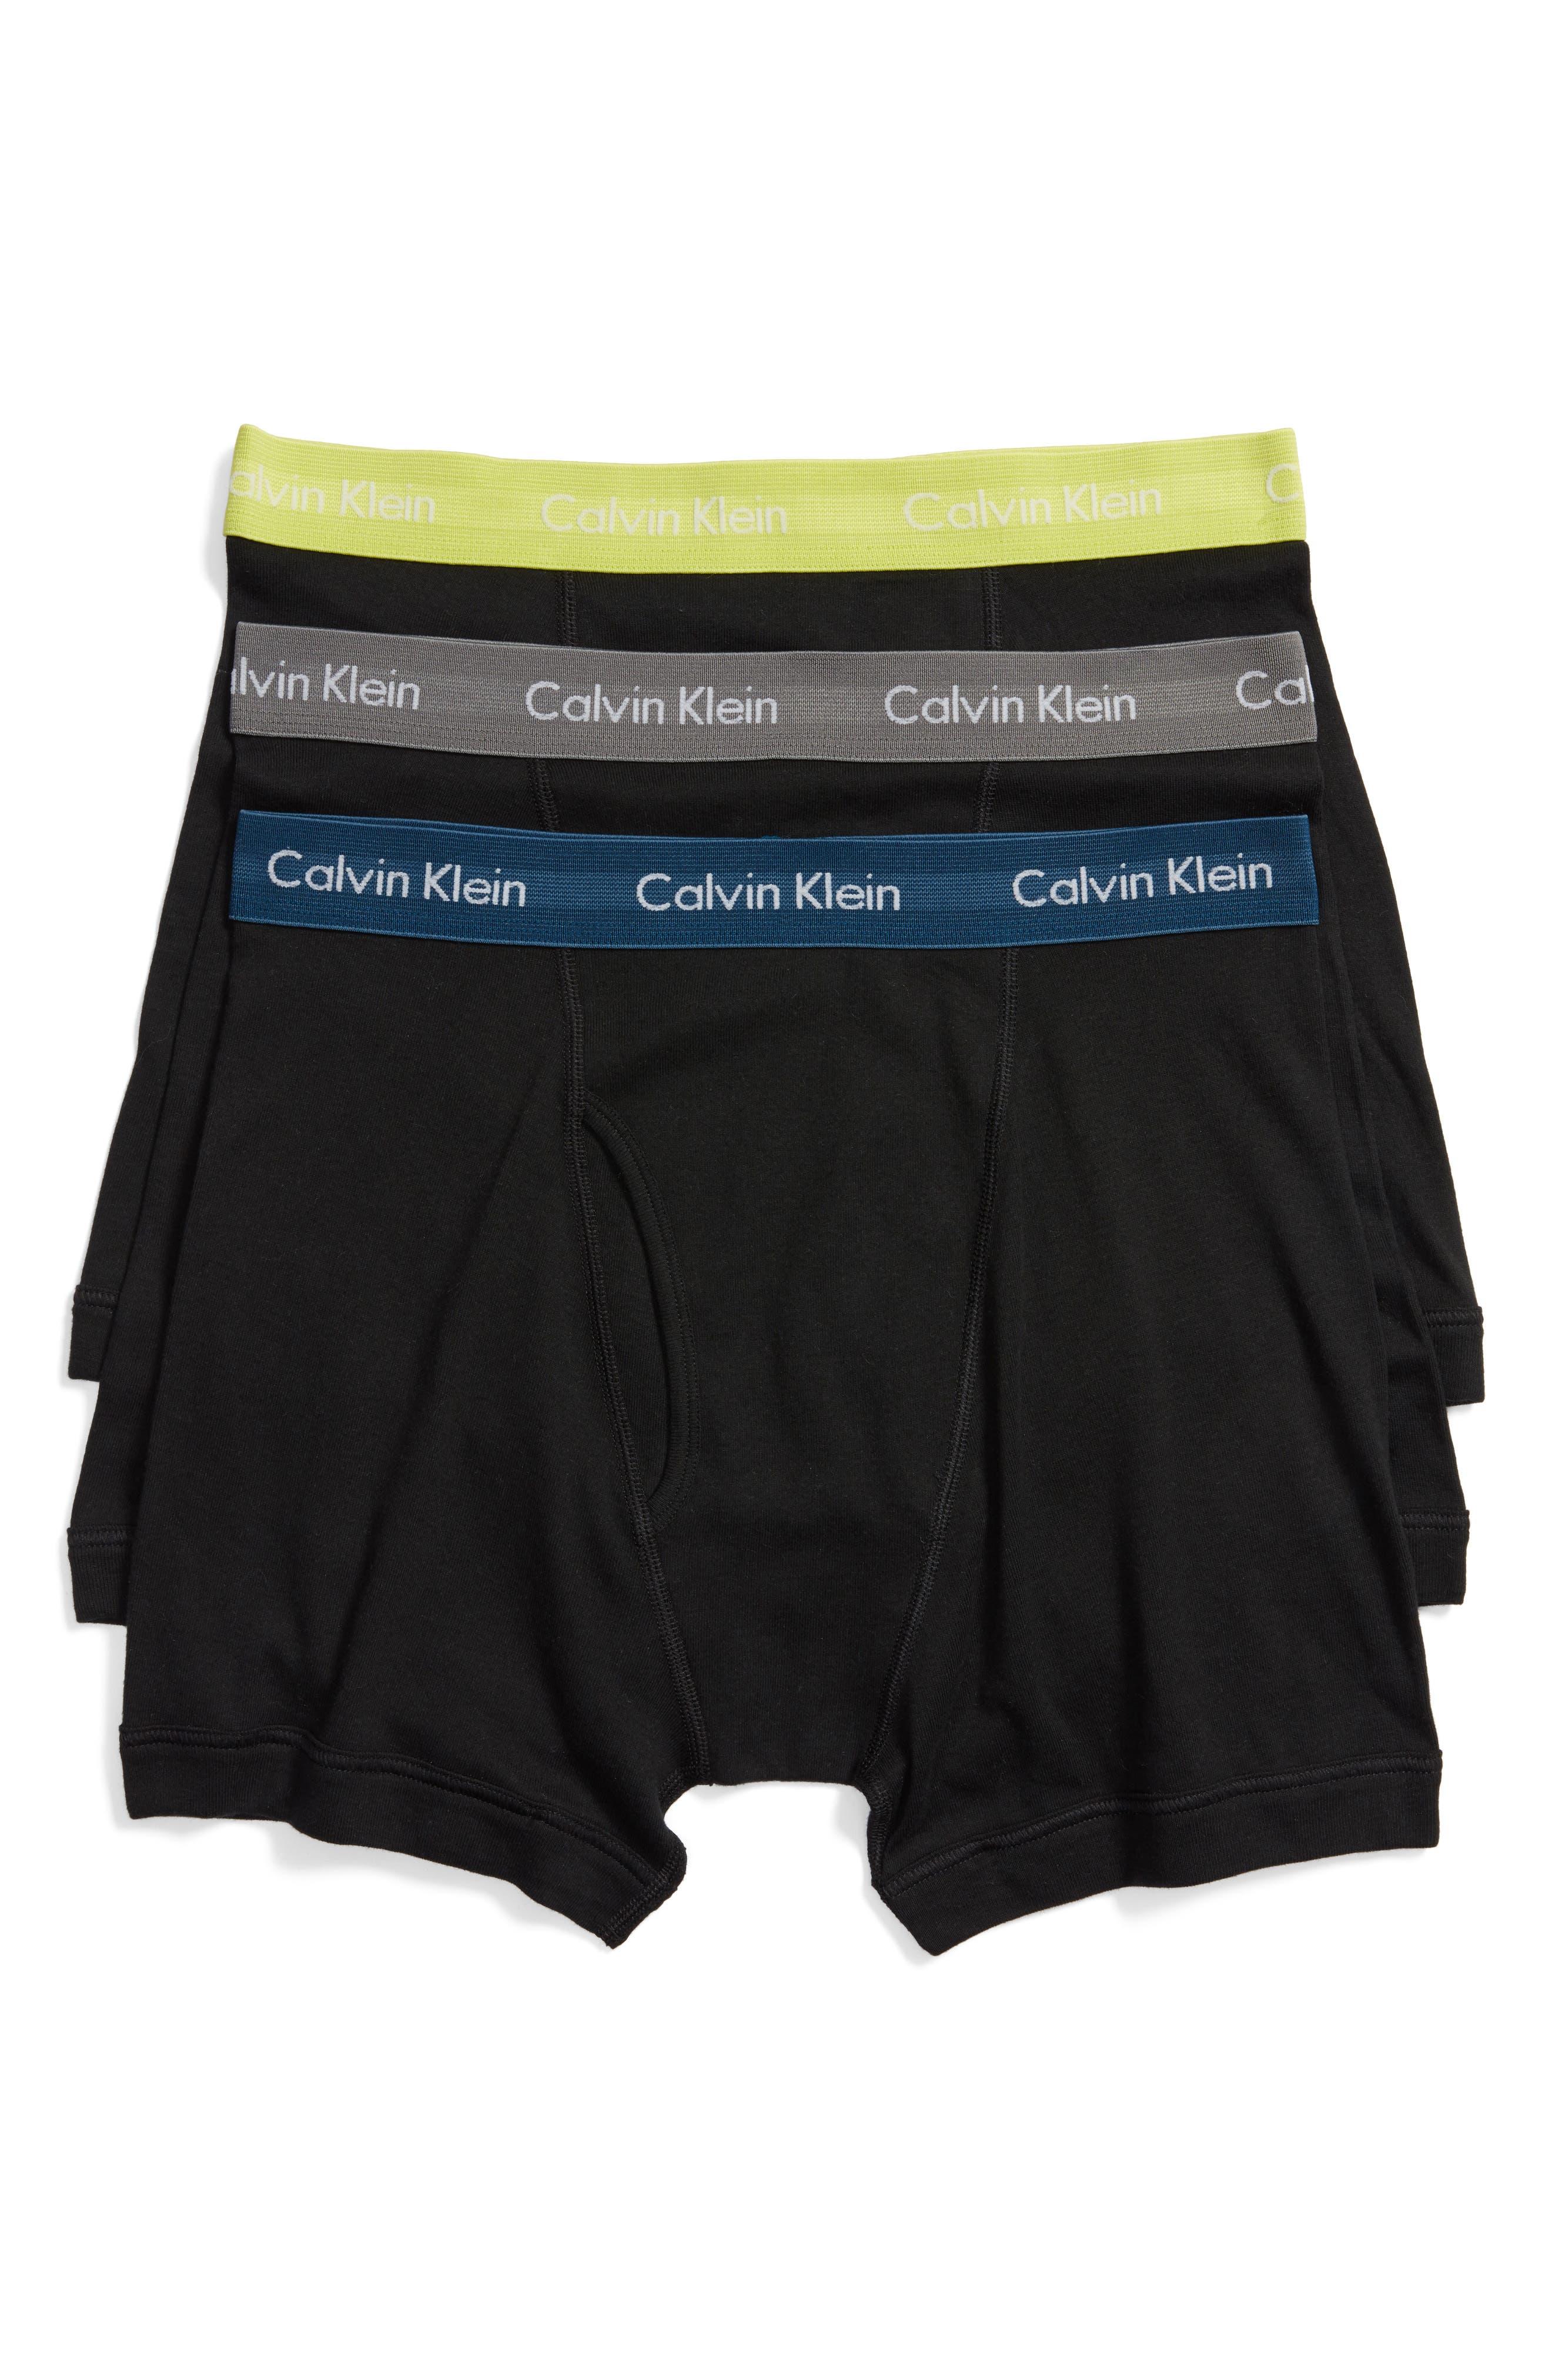 Main Image - Calvin Klein 3-Pack Boxer Briefs